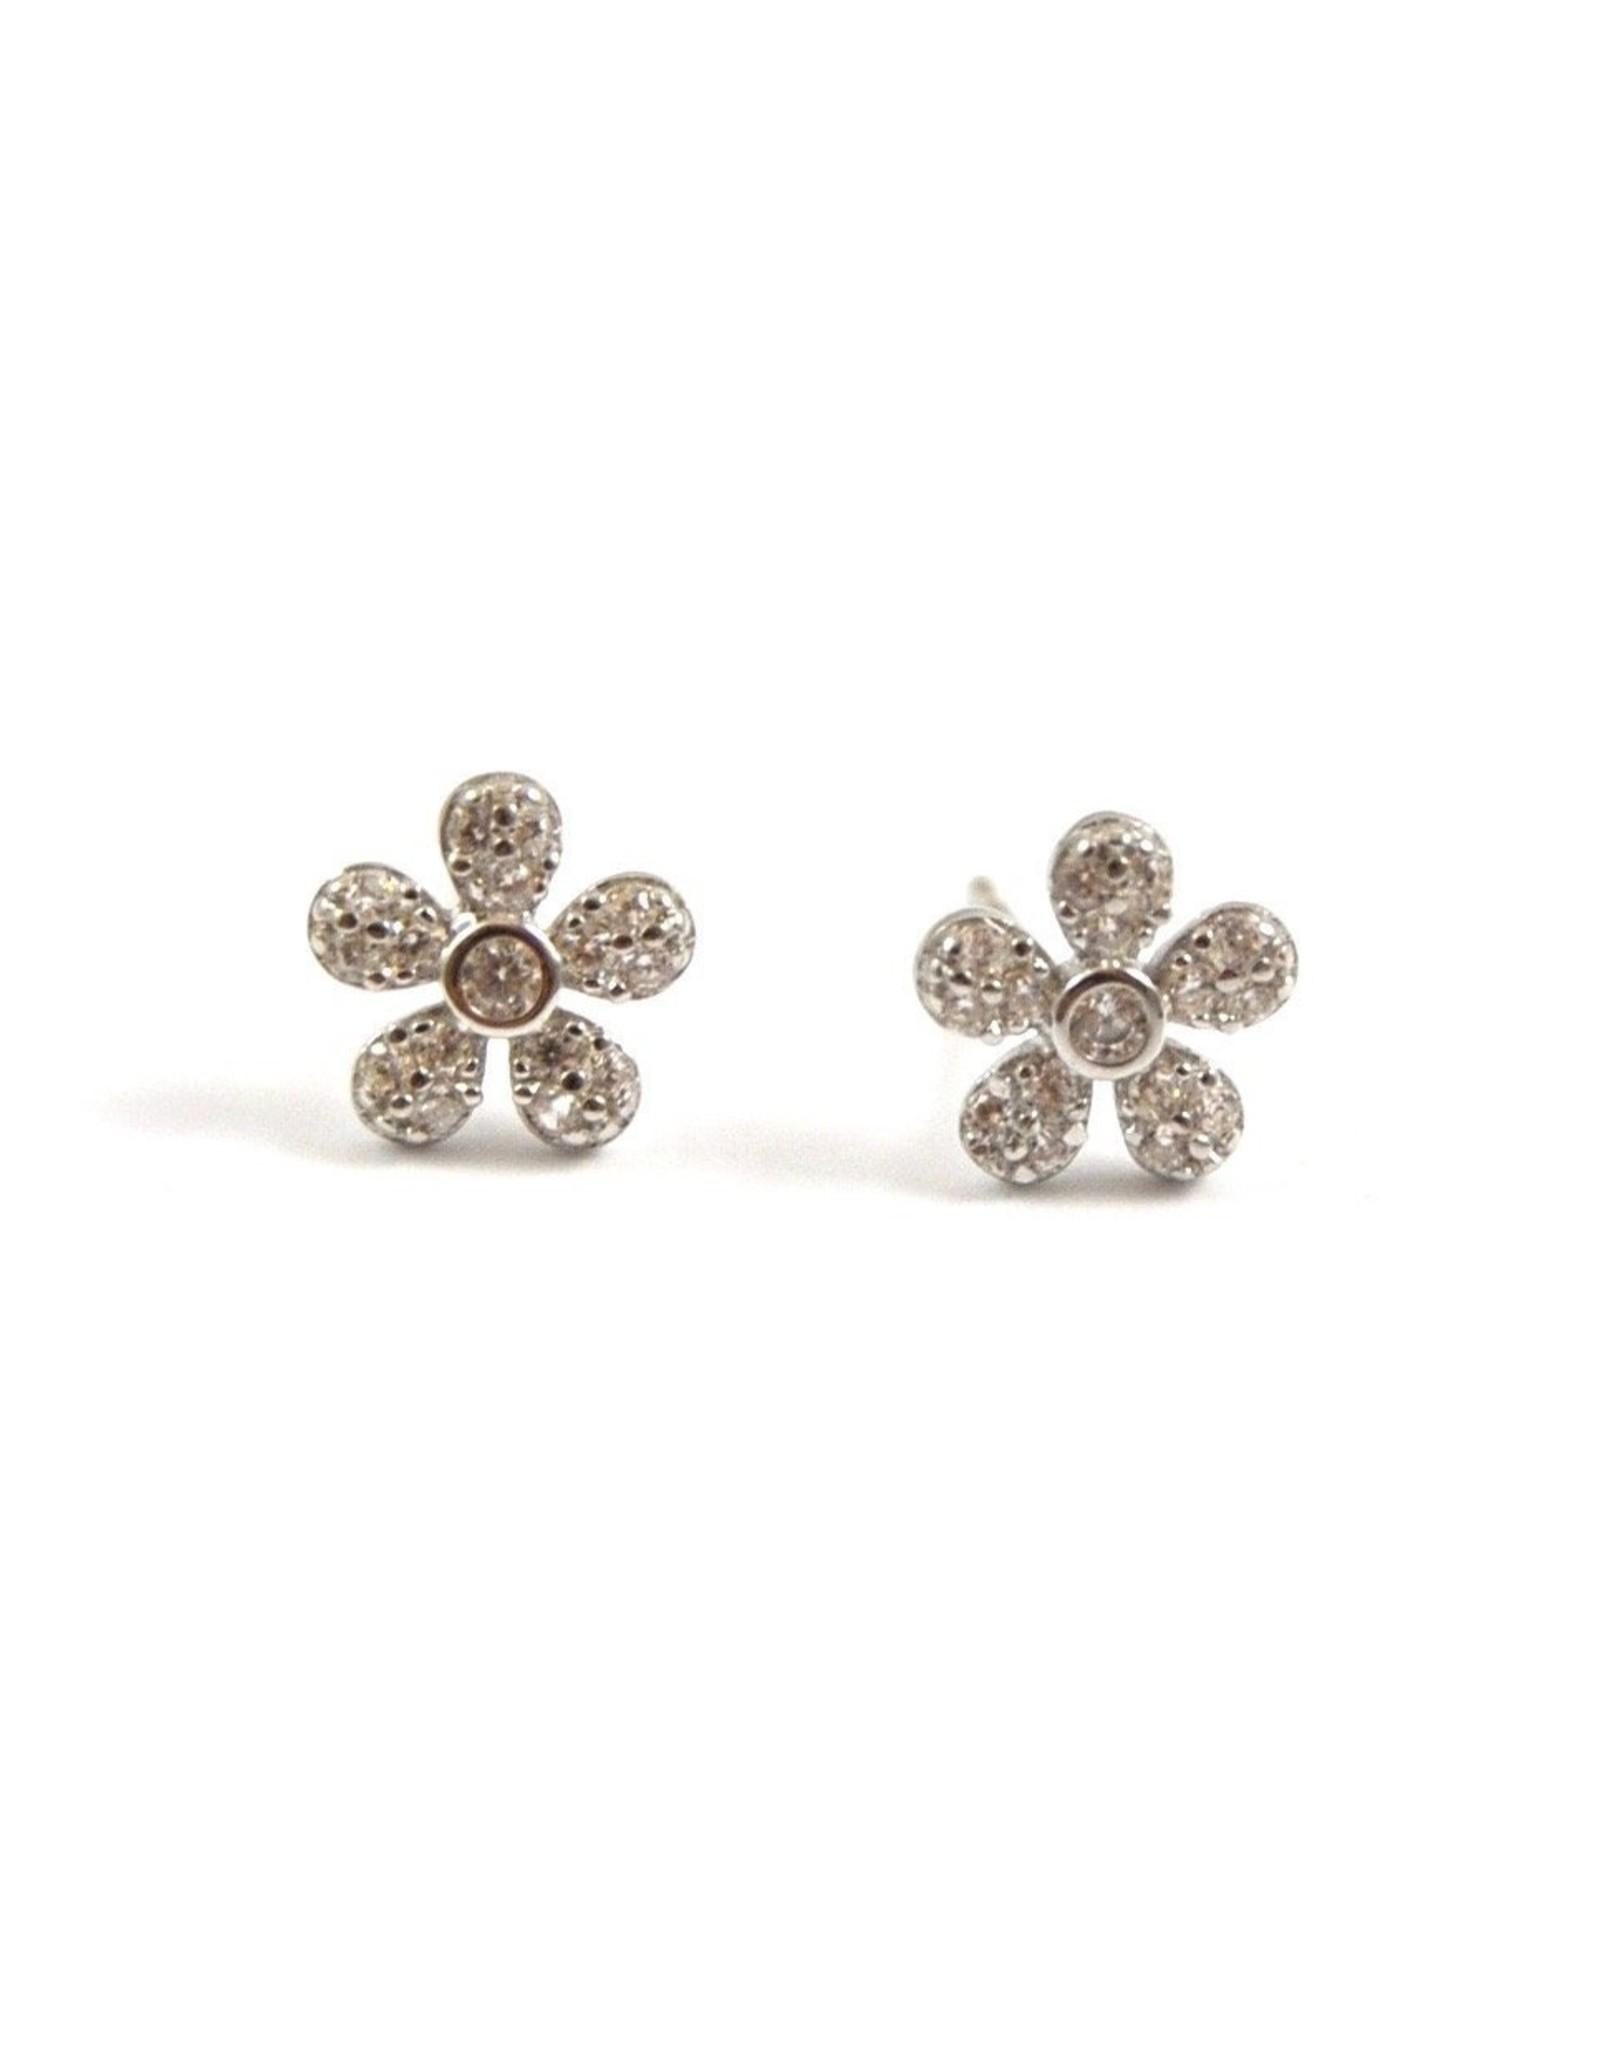 f.y.b. f.y.b. - Earrings Flower Studs Silver